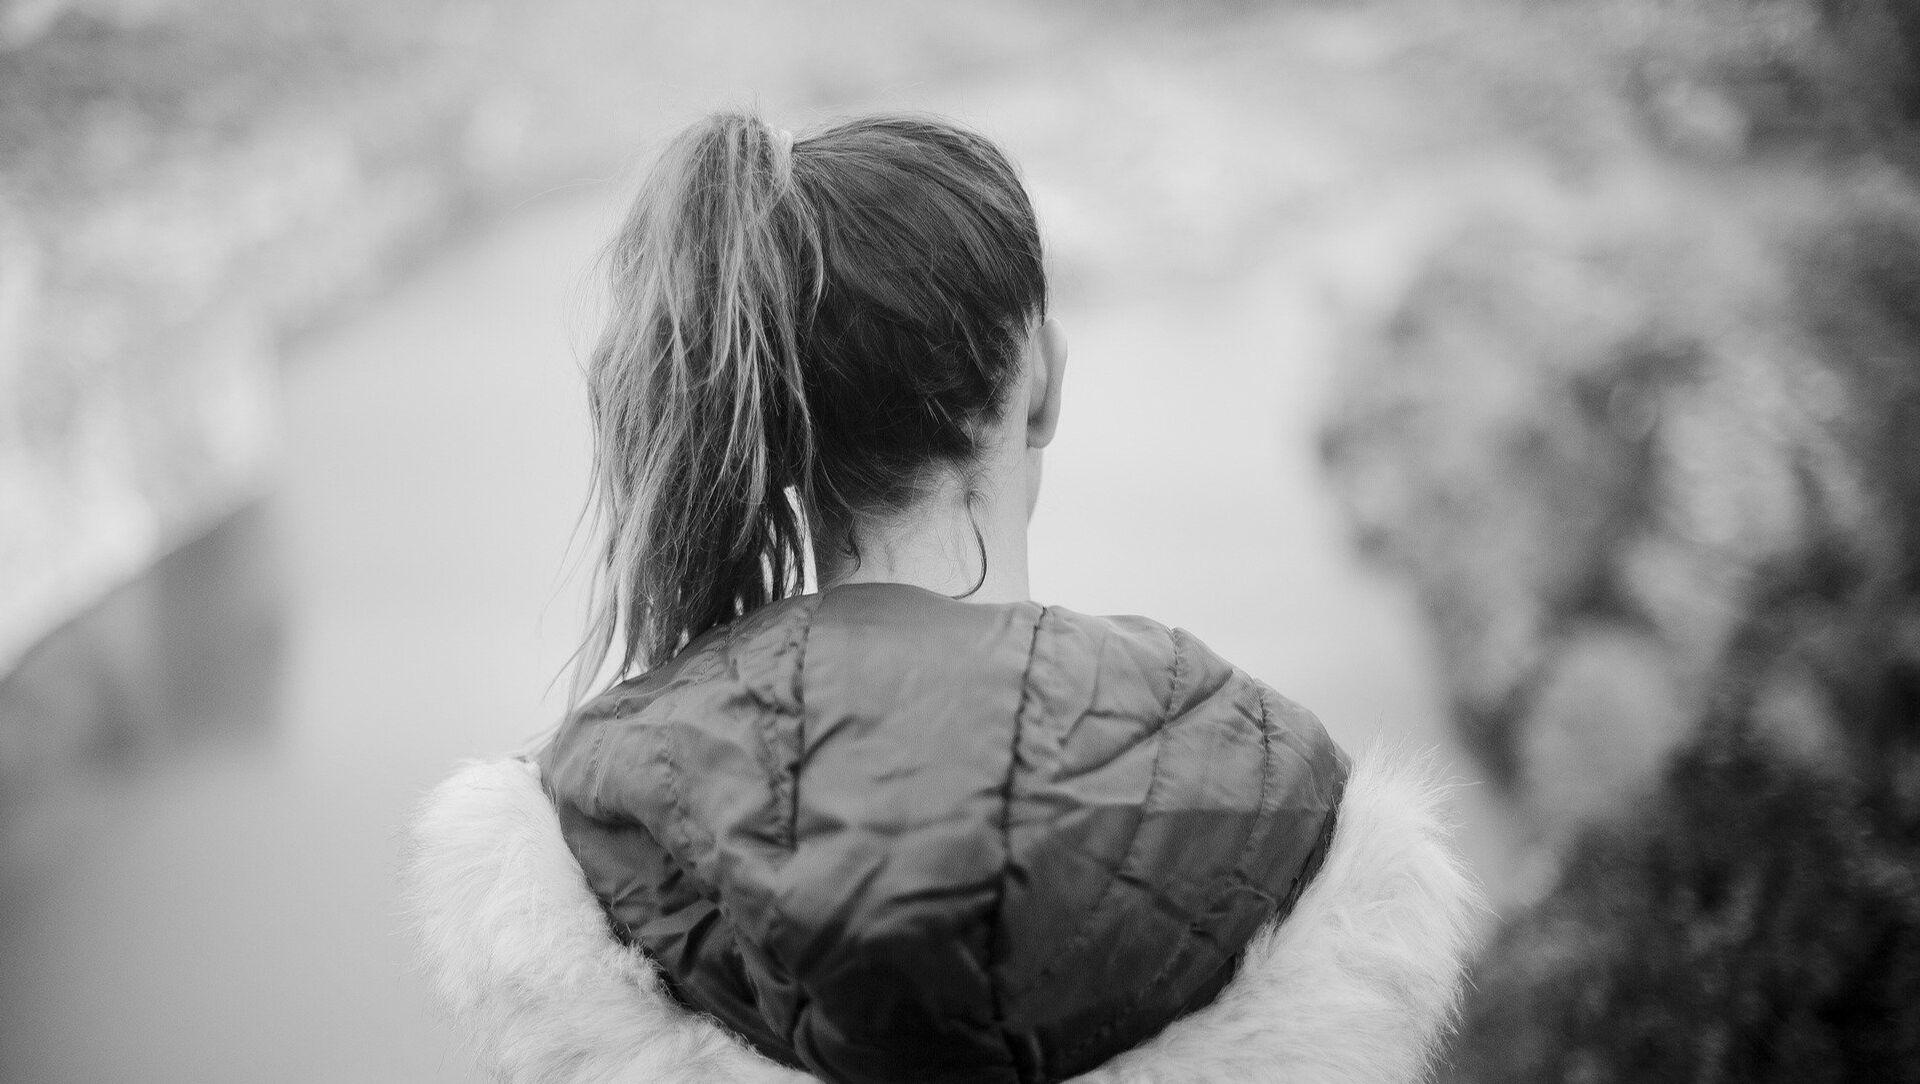 Mujer adolescente, imagen referencial - Sputnik Mundo, 1920, 07.02.2019